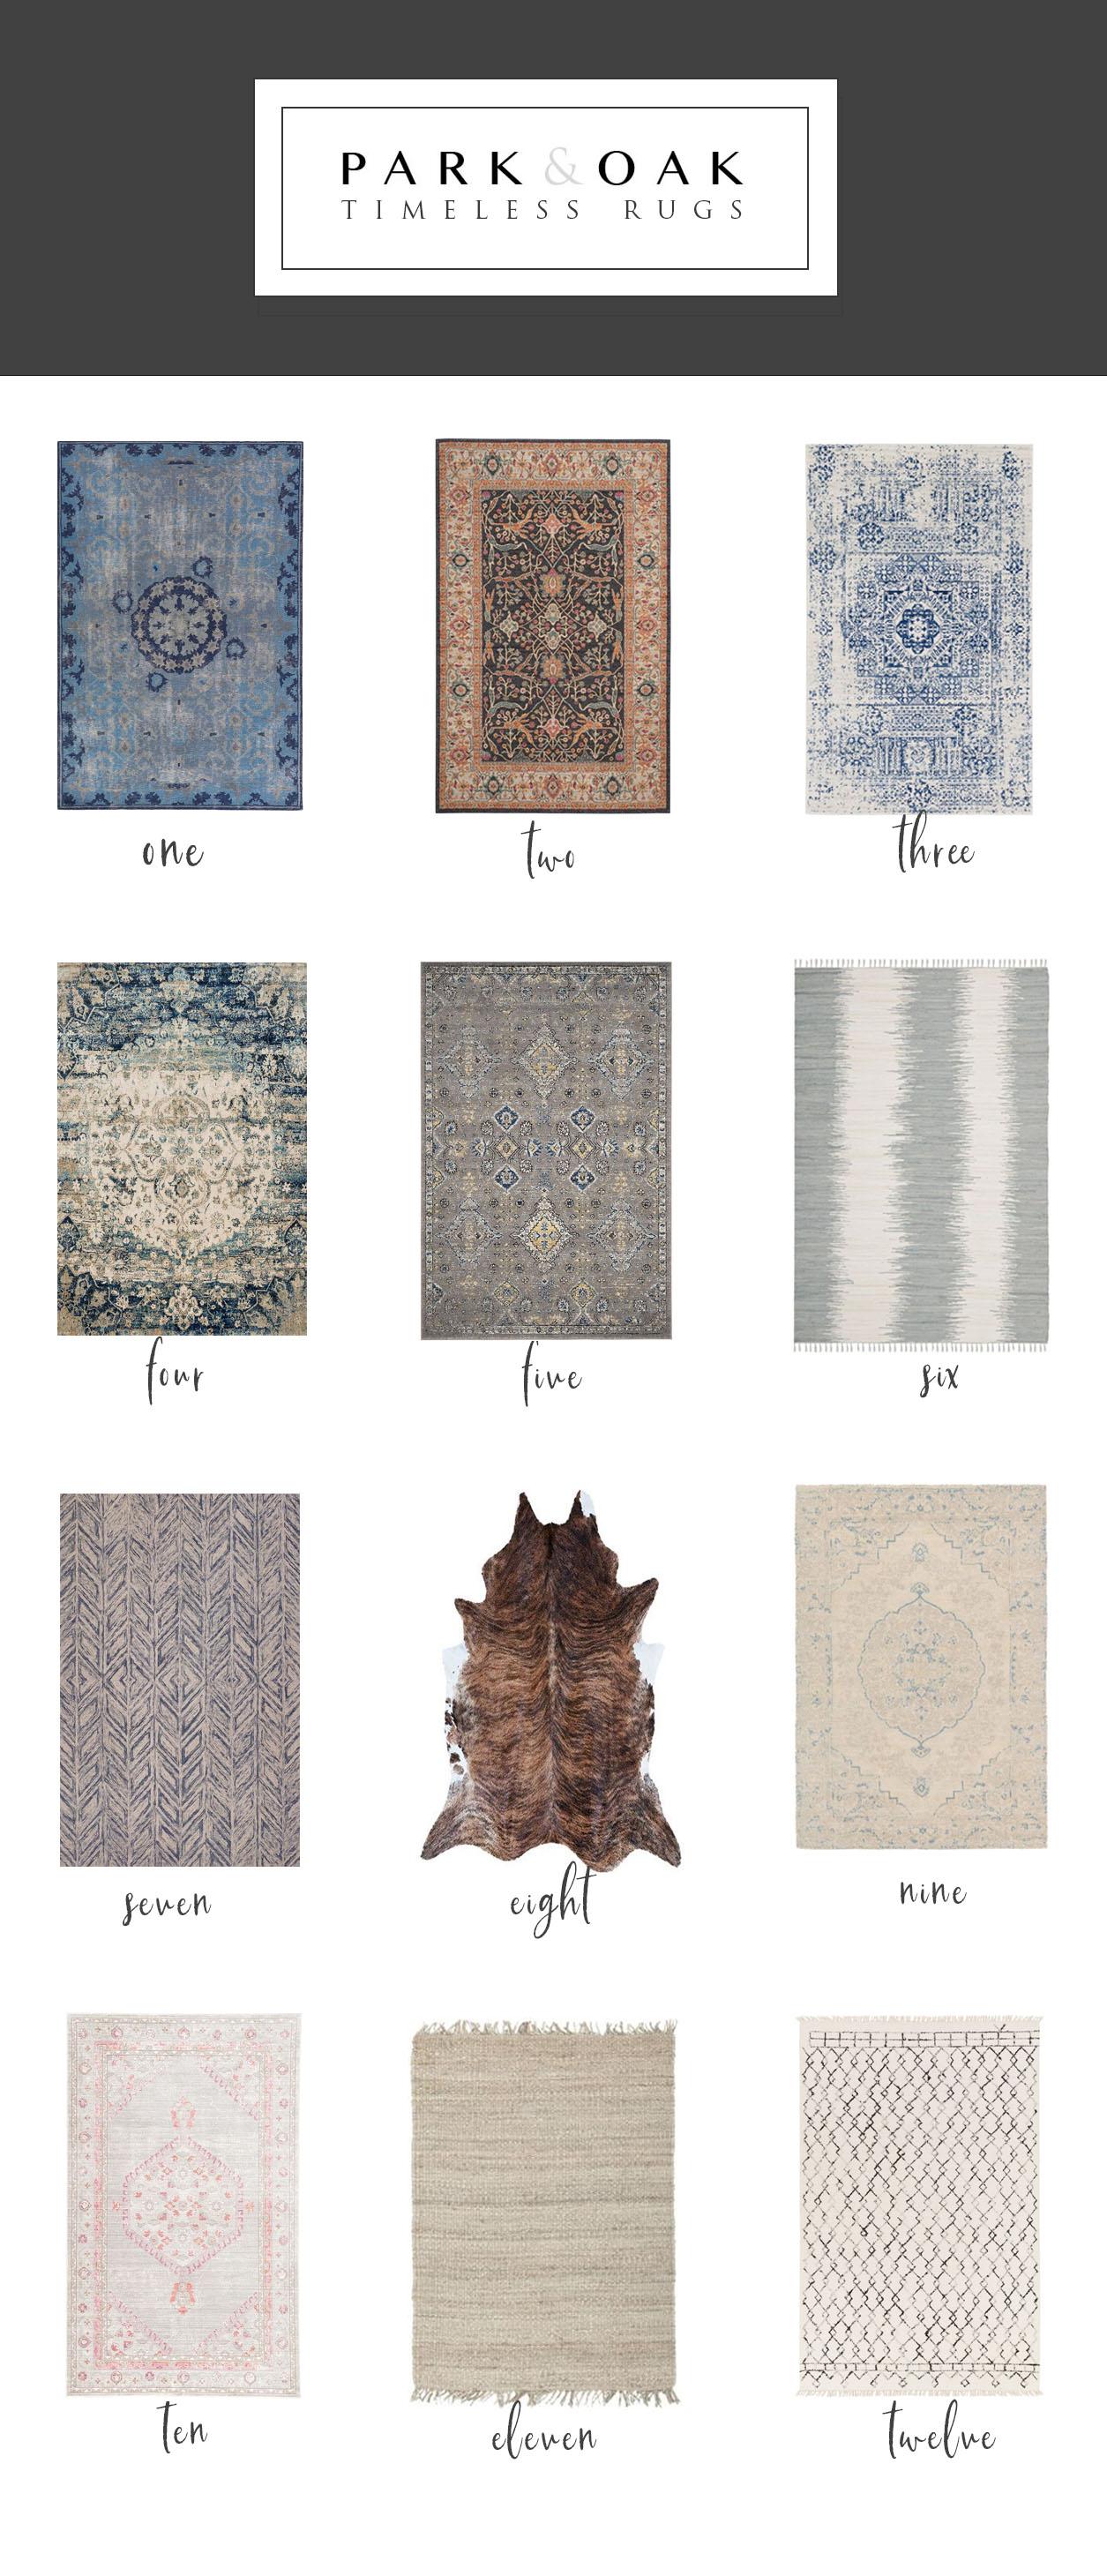 Park & Oak timeless rugs